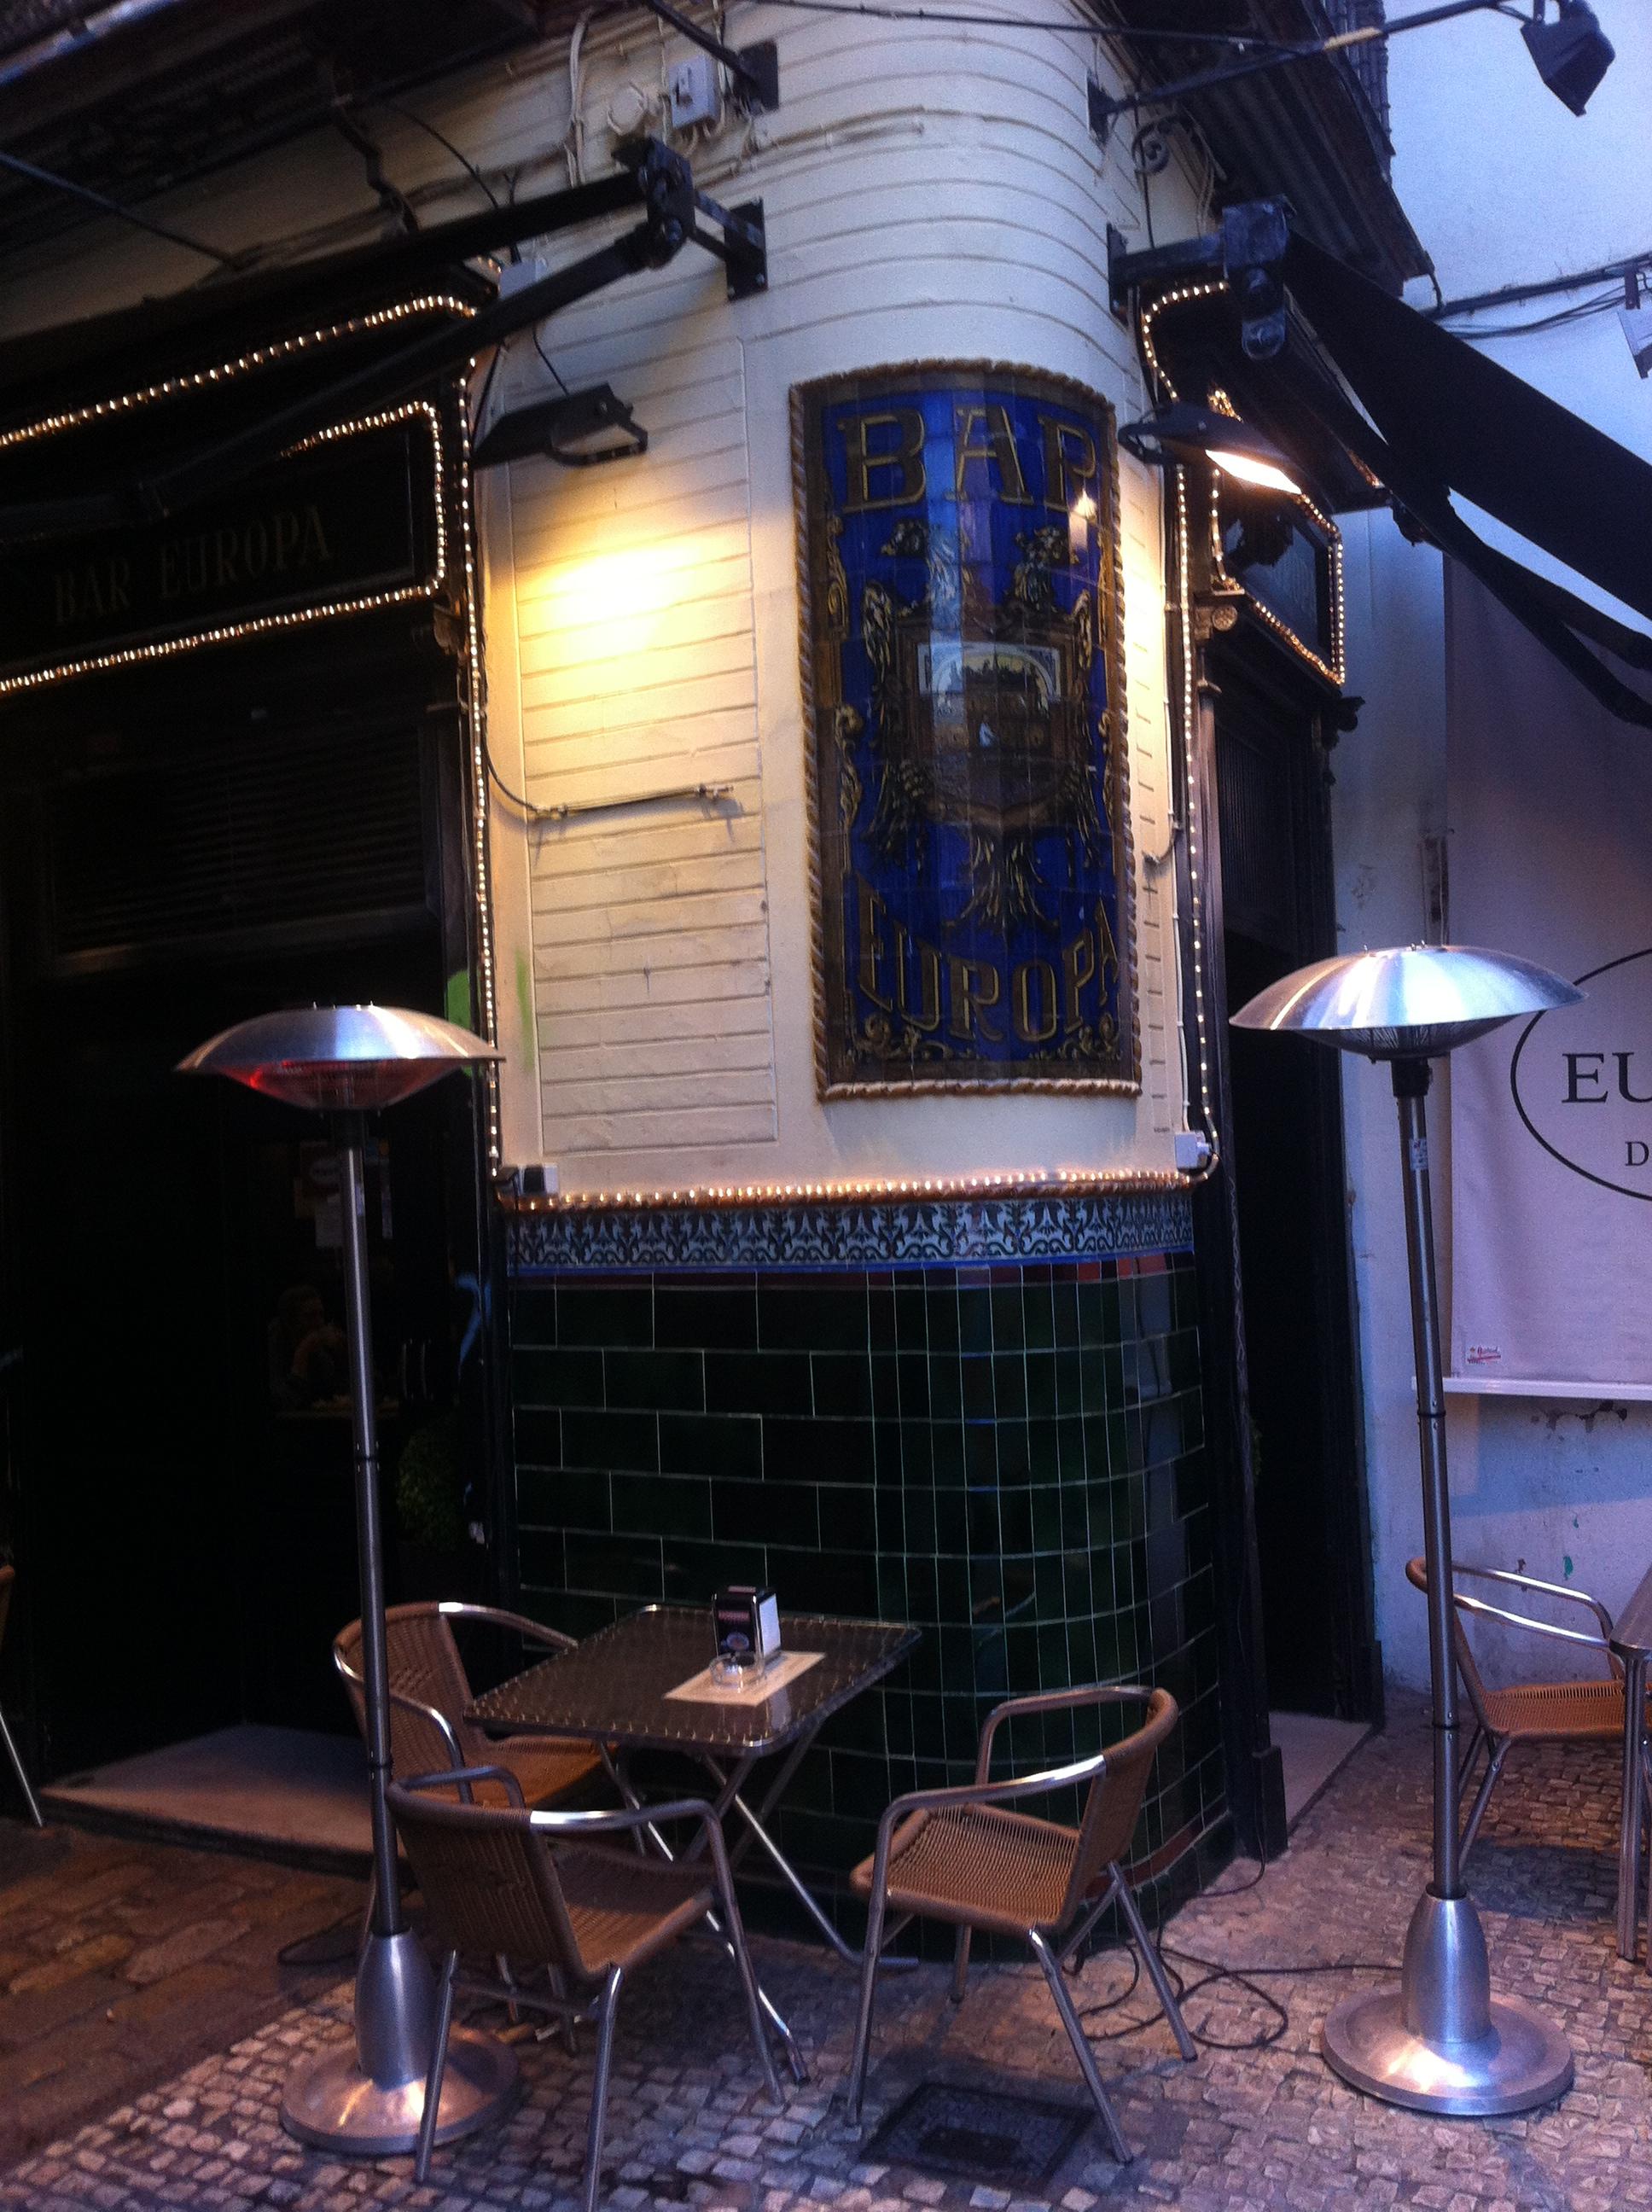 Bar Europa Seville